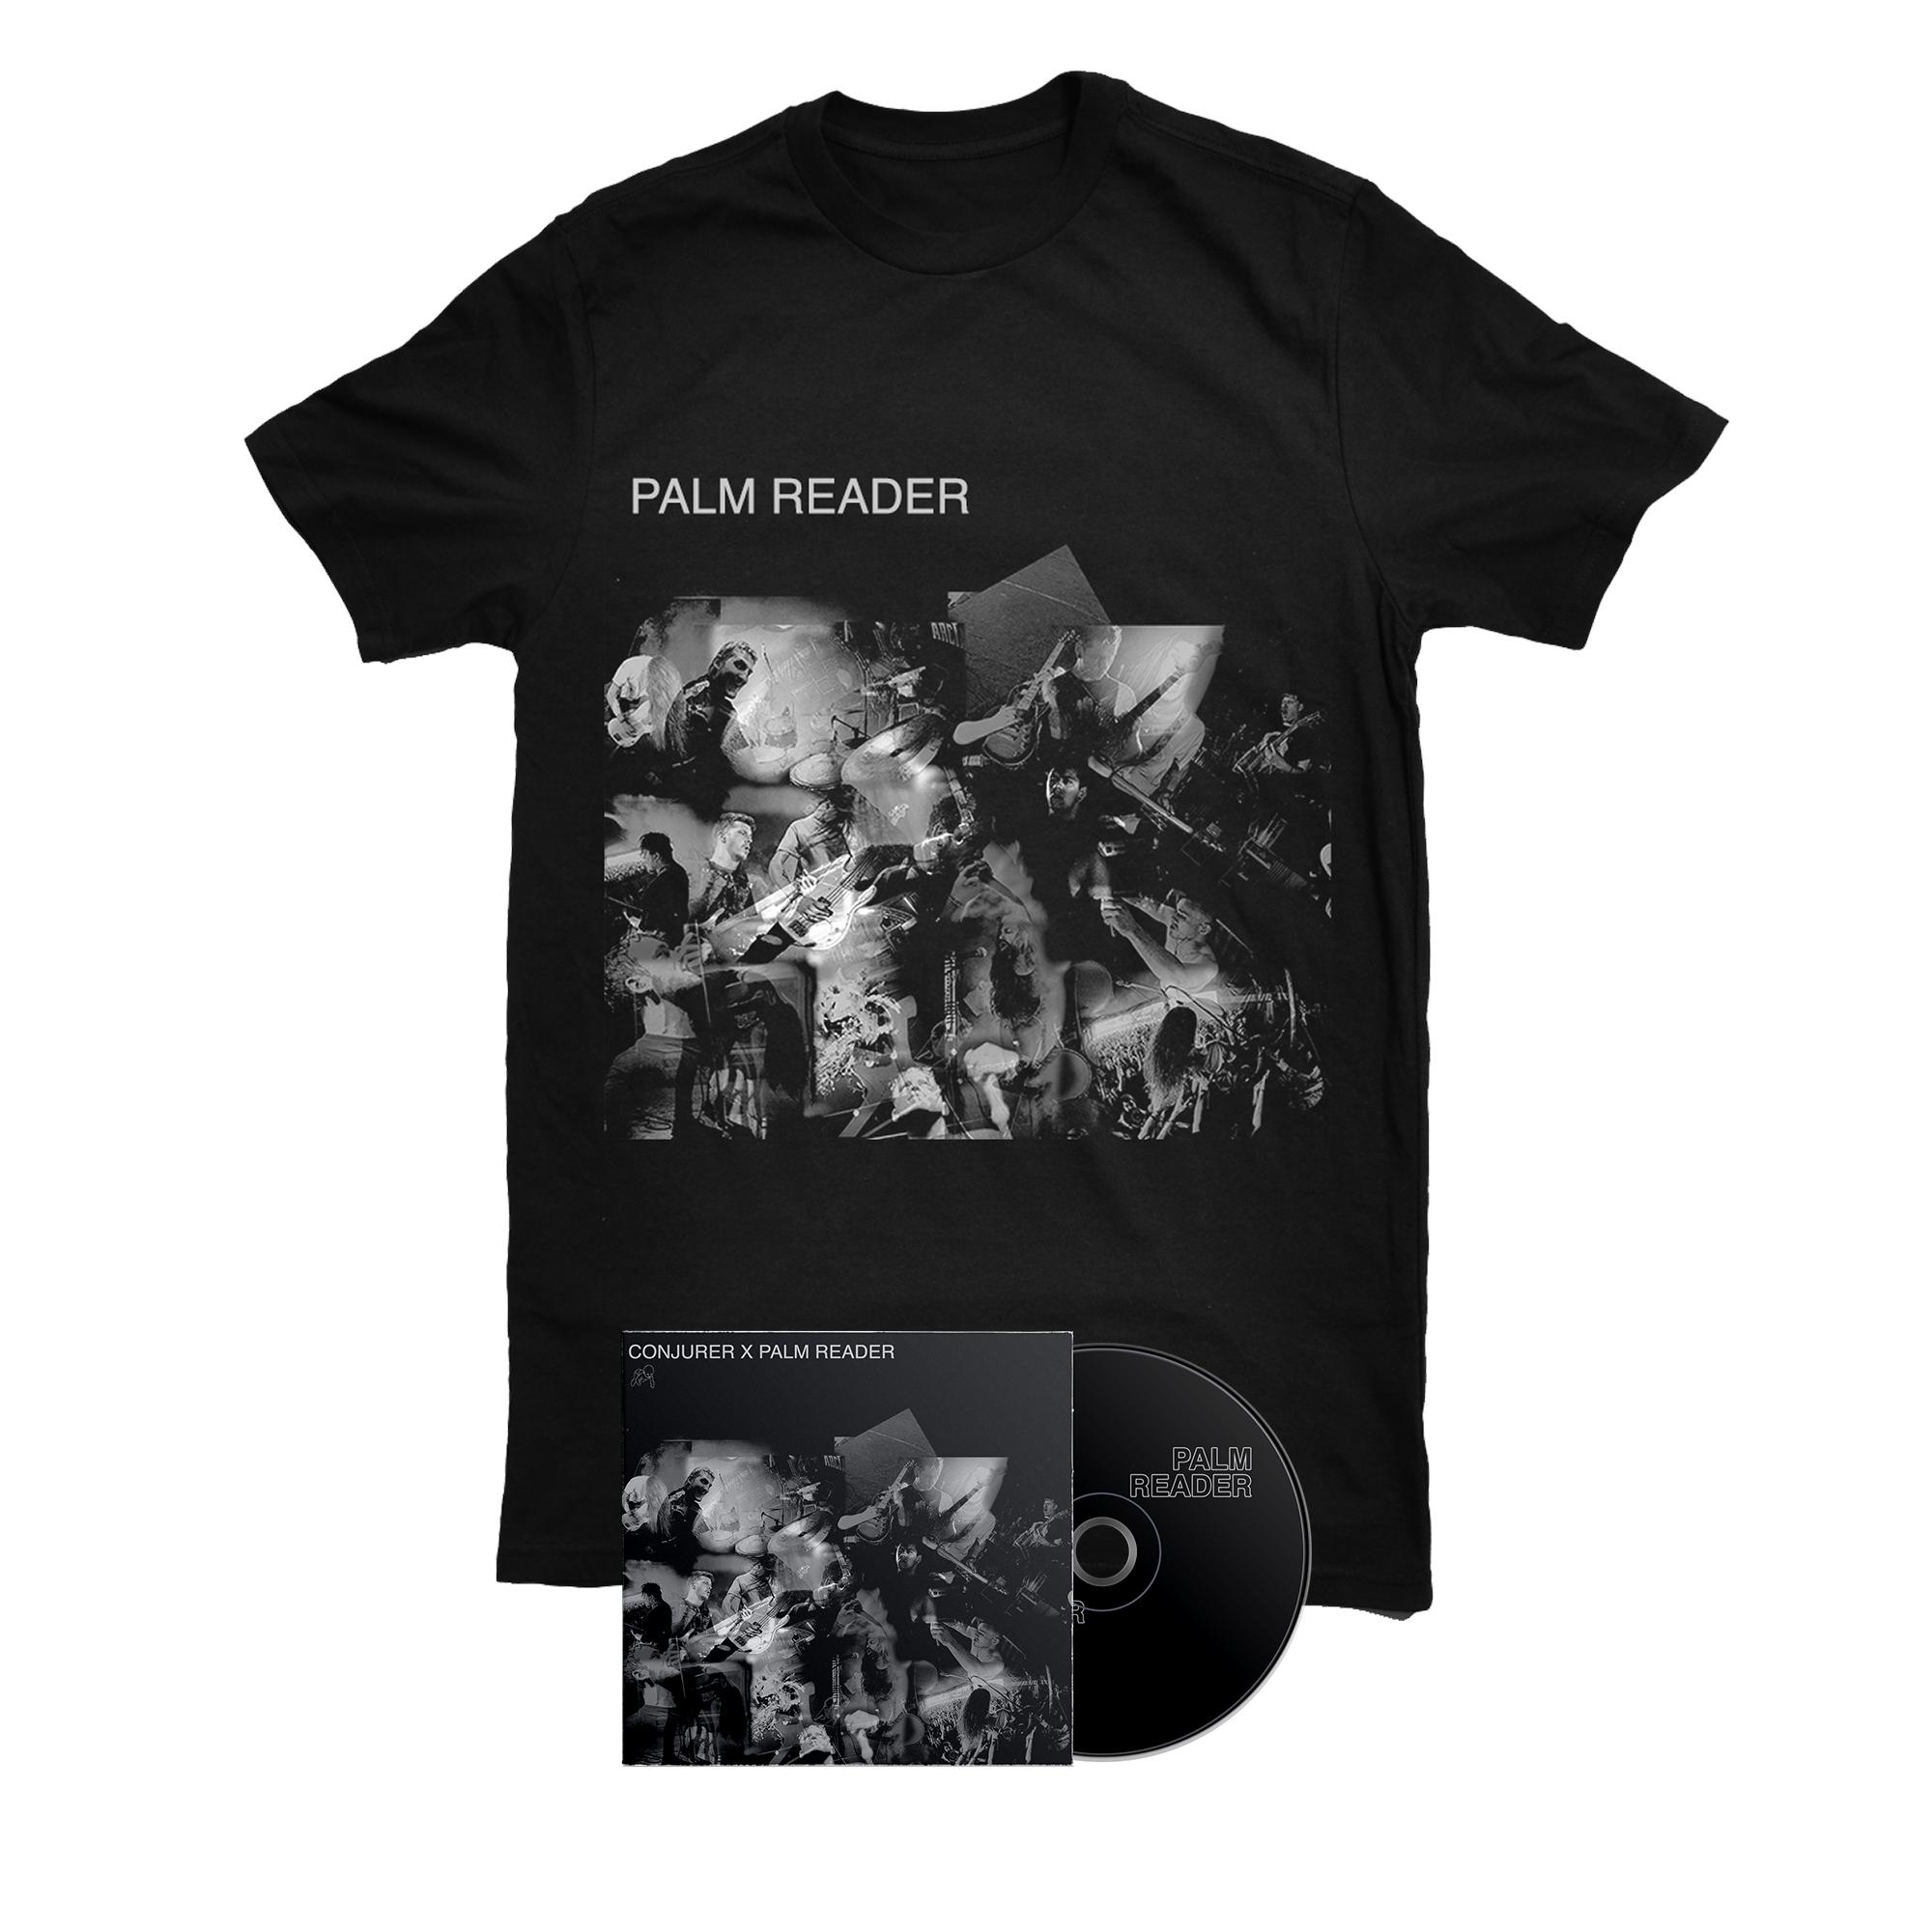 Conjurer & Palm Reader - Palm Reader shirt + CD